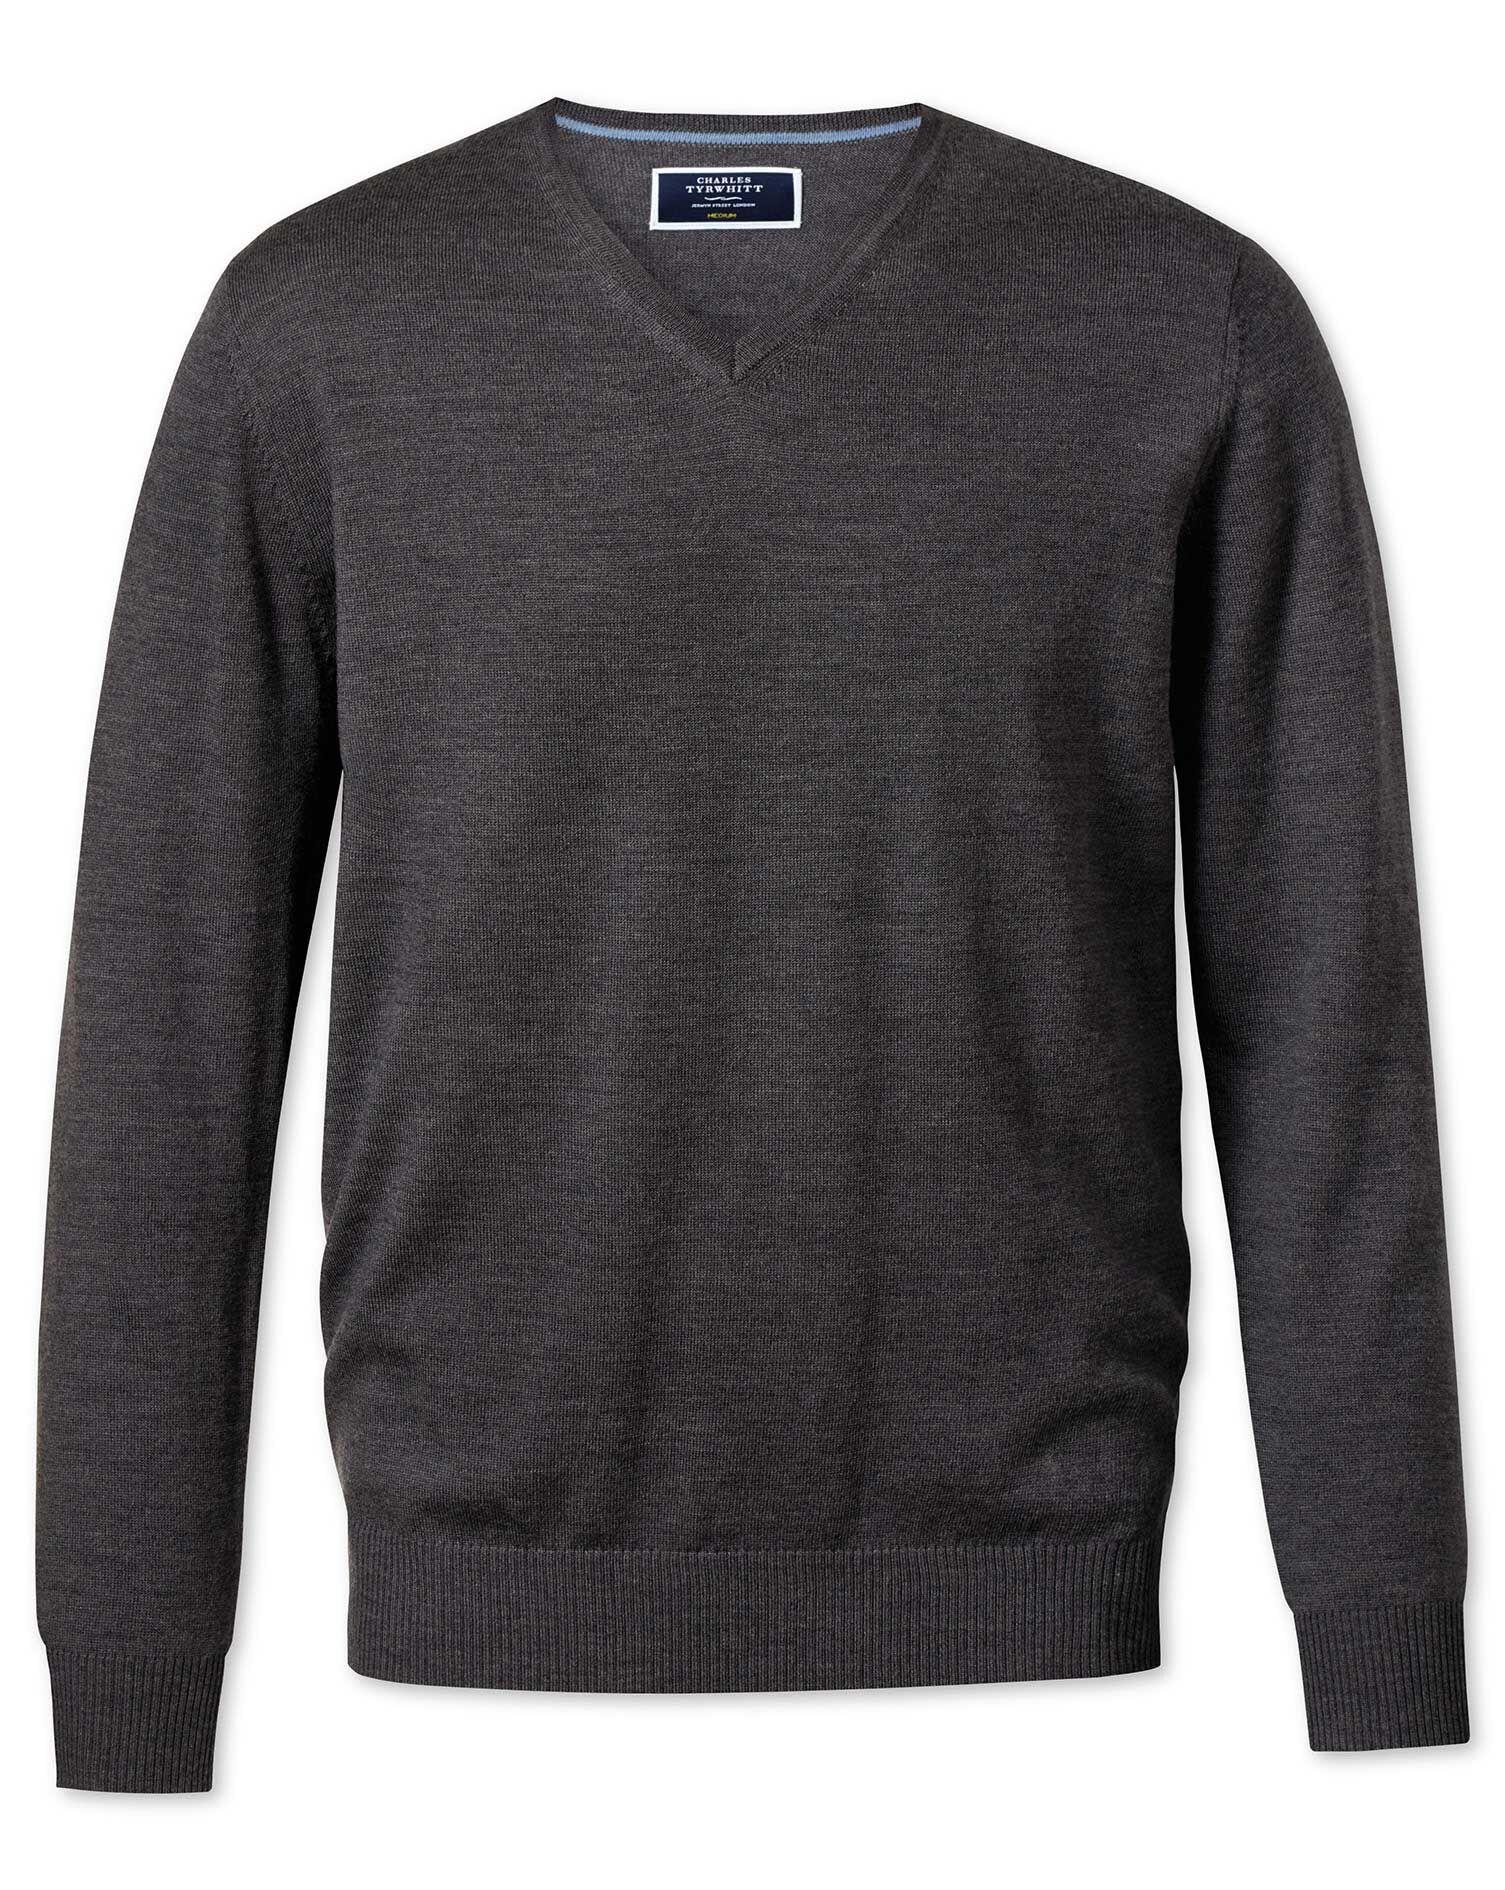 Charcoal Merino Wool V-Neck Jumper Size XL by Charles Tyrwhitt